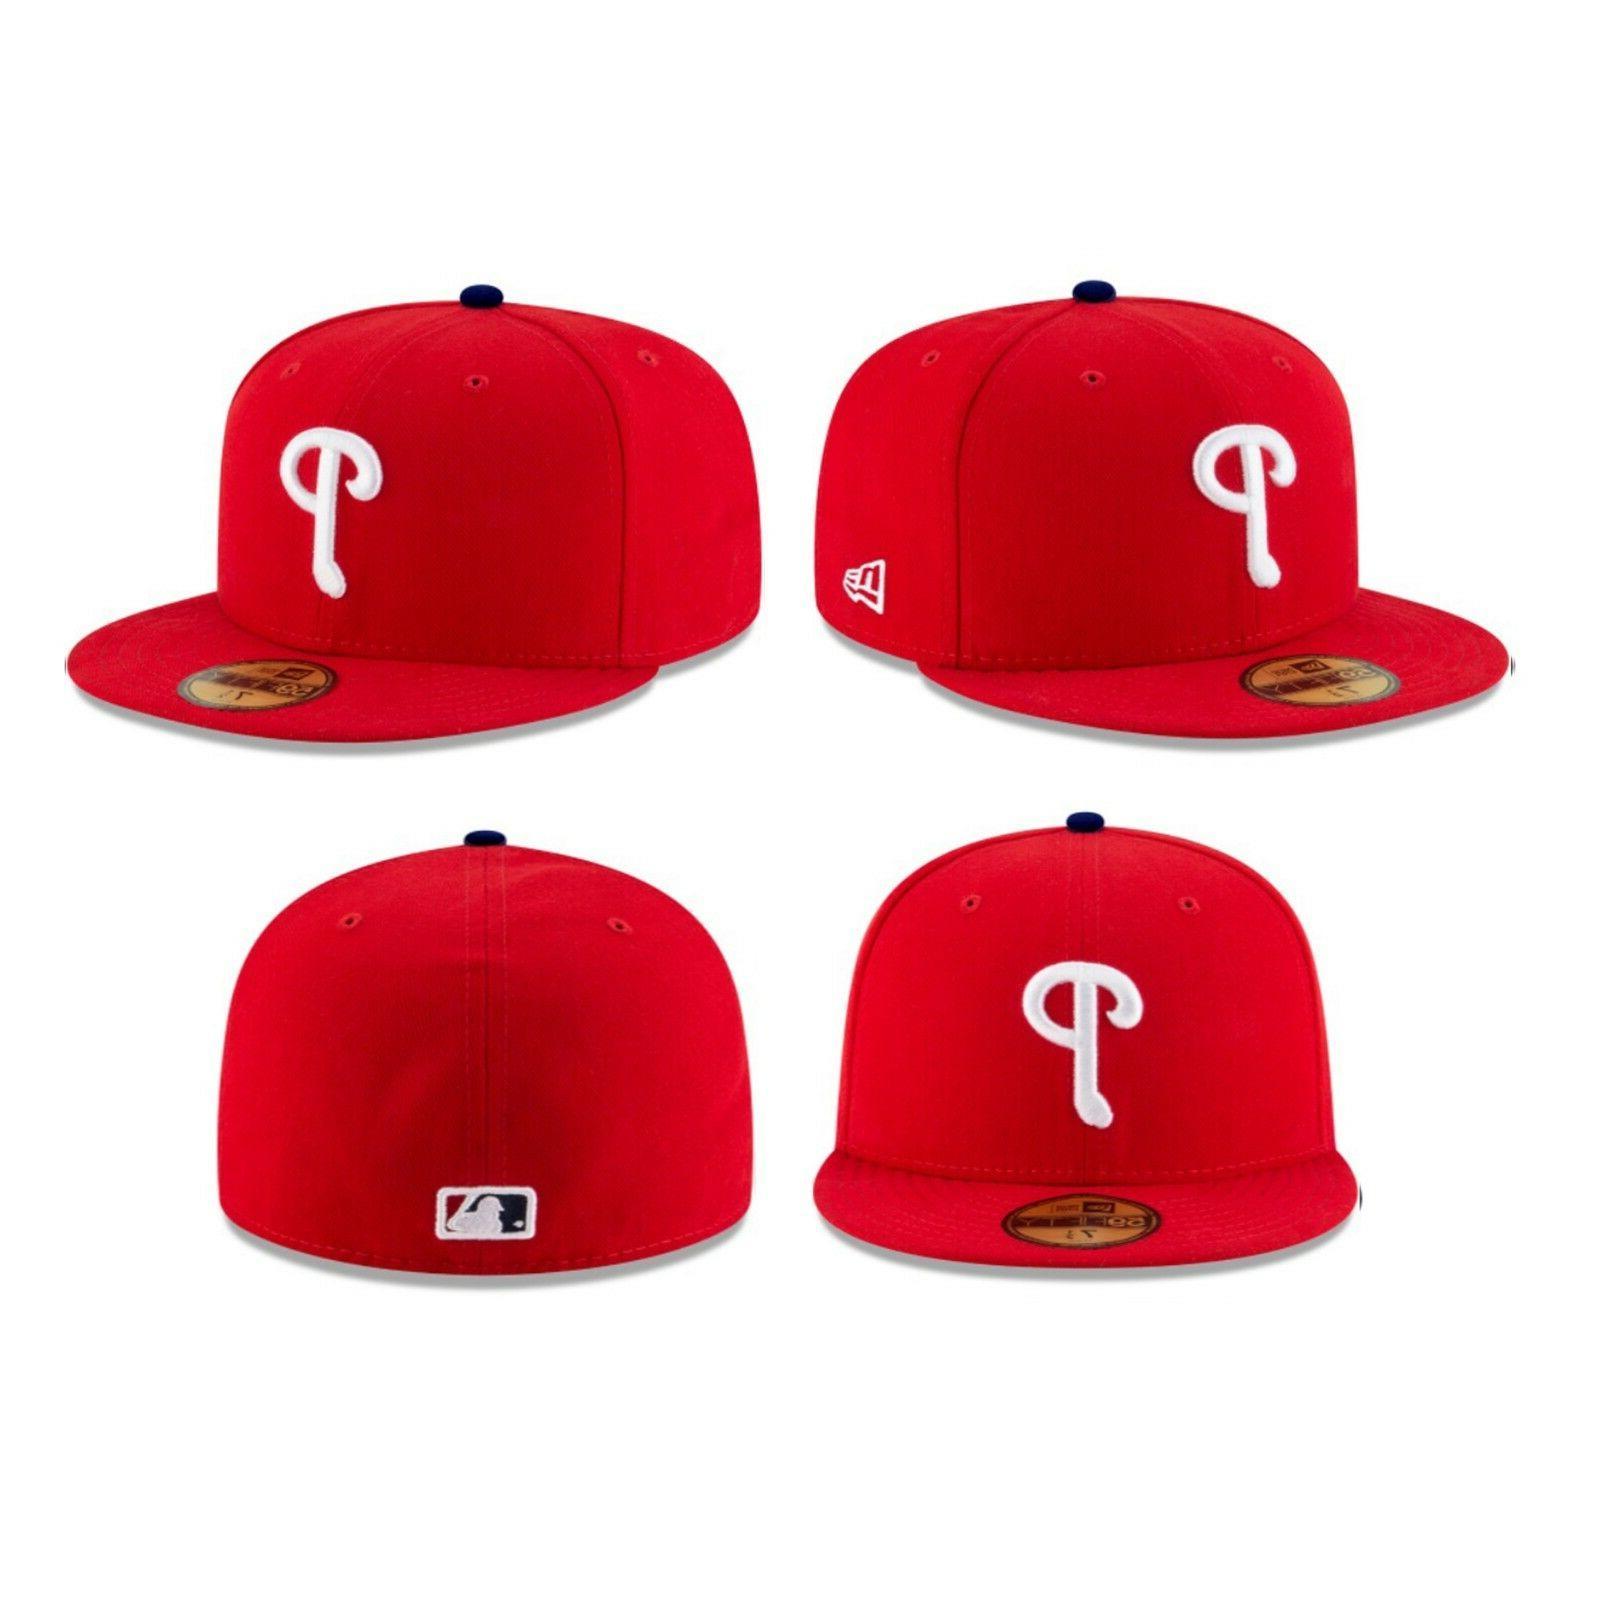 Philadelphia Phillies PHI Authentic New 59FIFTY Red